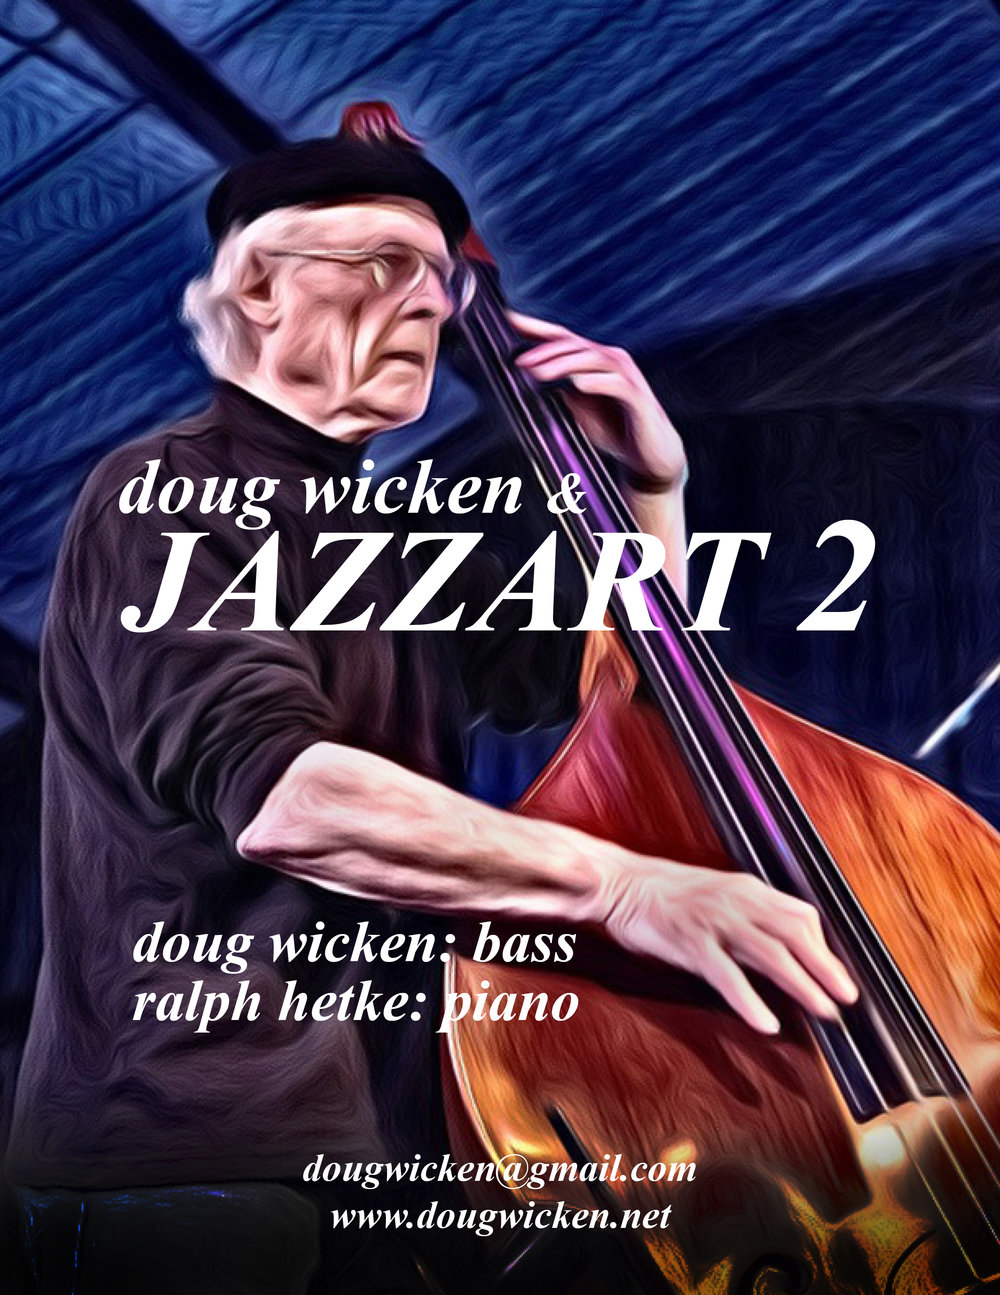 DOUG WICKEN 2 REV poster.jpg